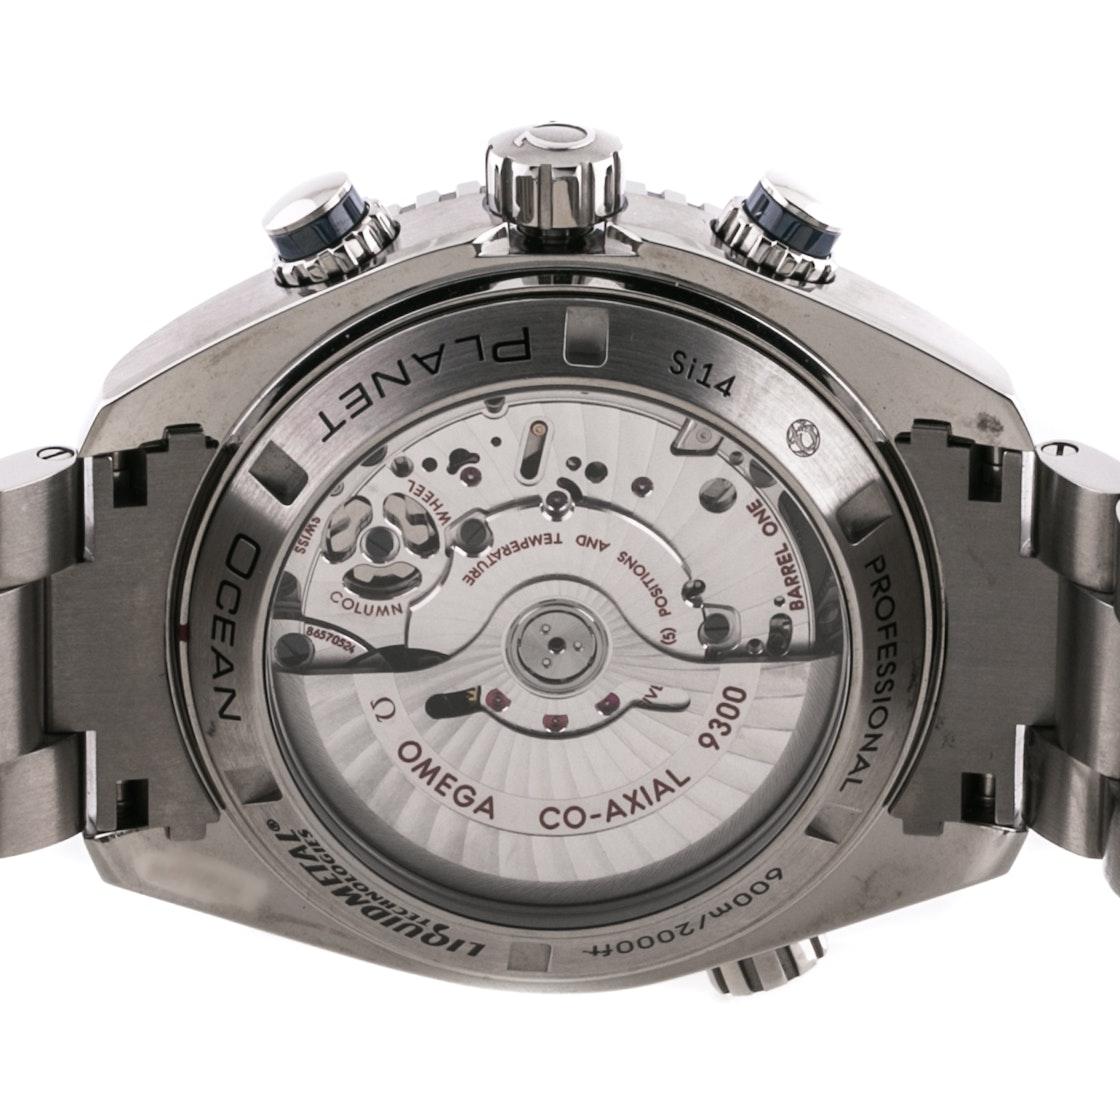 Omega Seamaster Planet Ocean 600m Chronograph 232.90.46.51.03.001